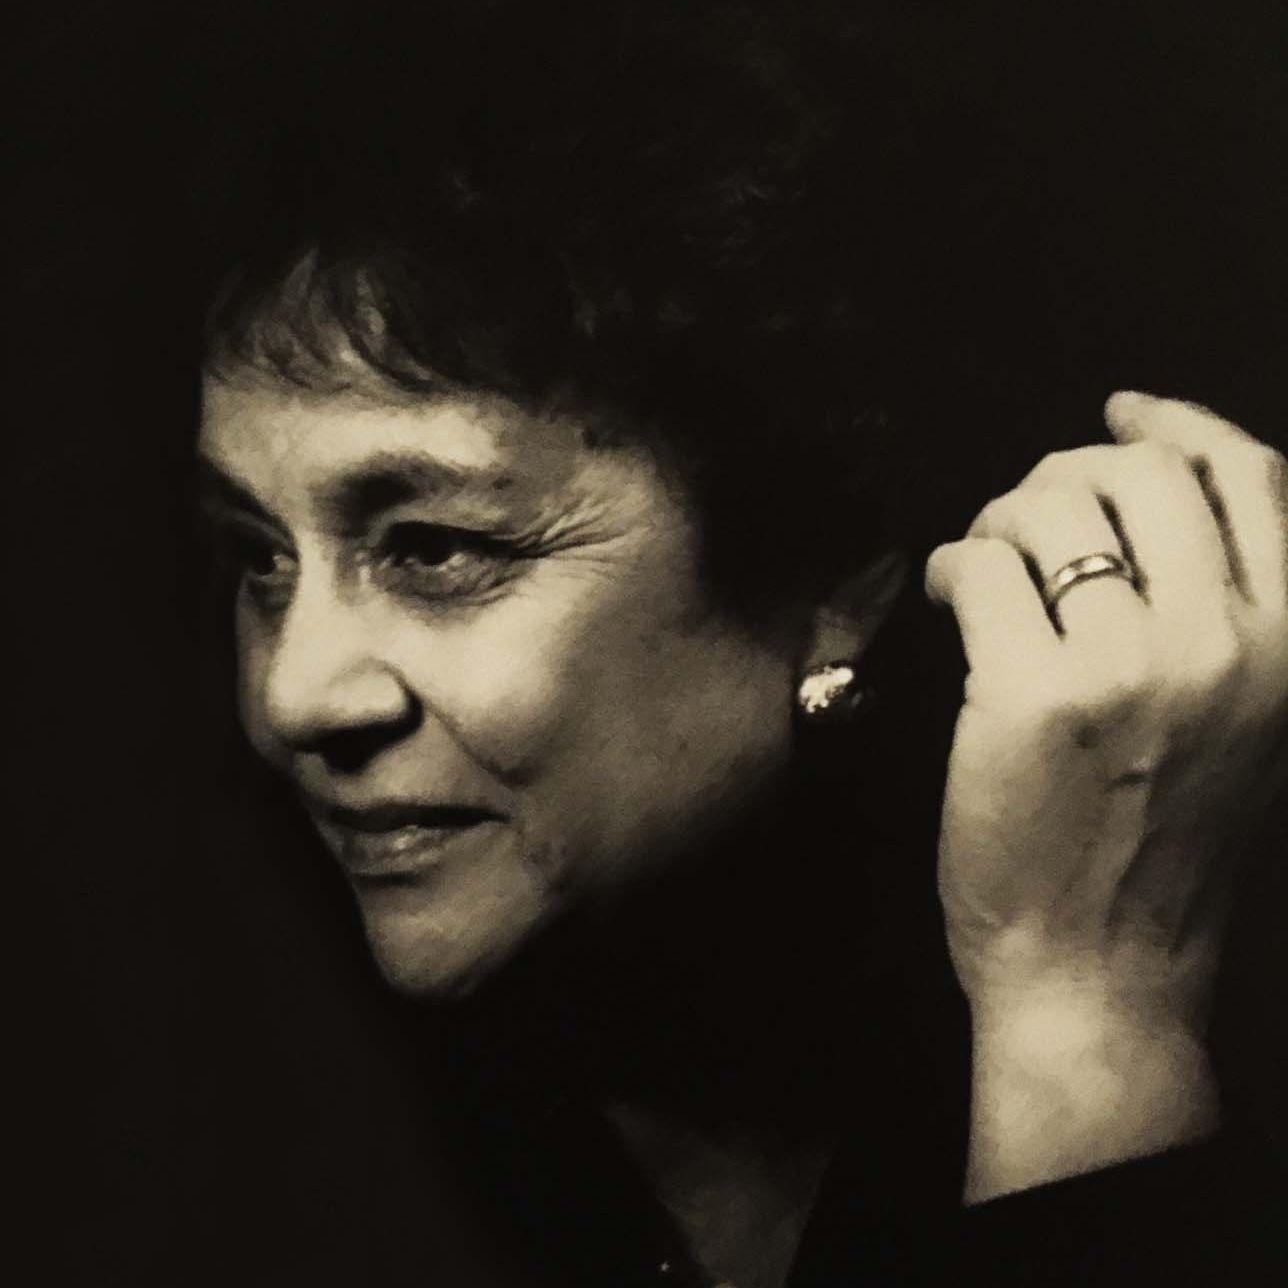 Elena Manetti